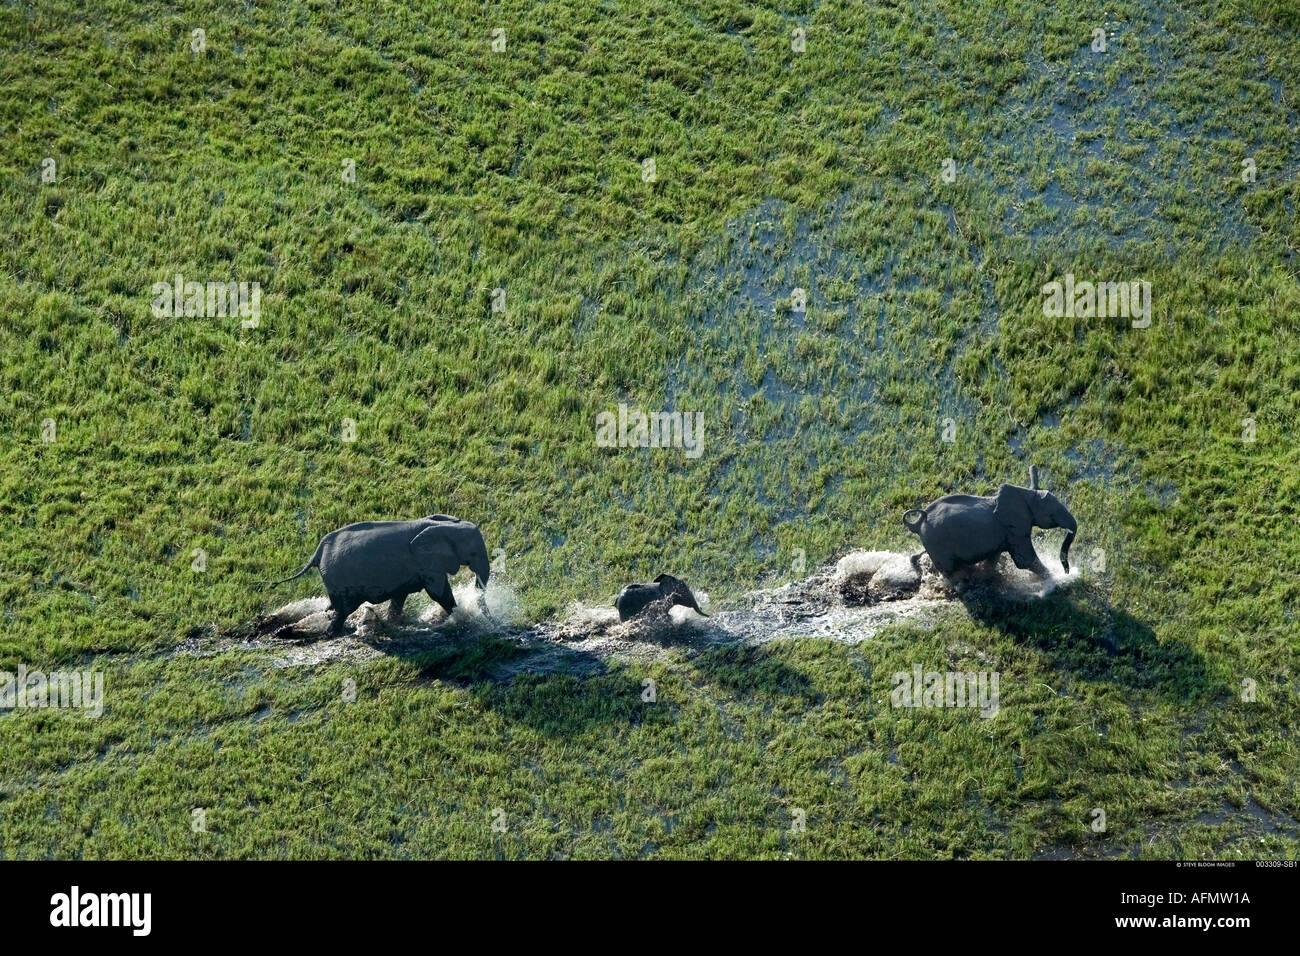 Aerial view of elephant family Okavango Delta Botswana - Stock Image